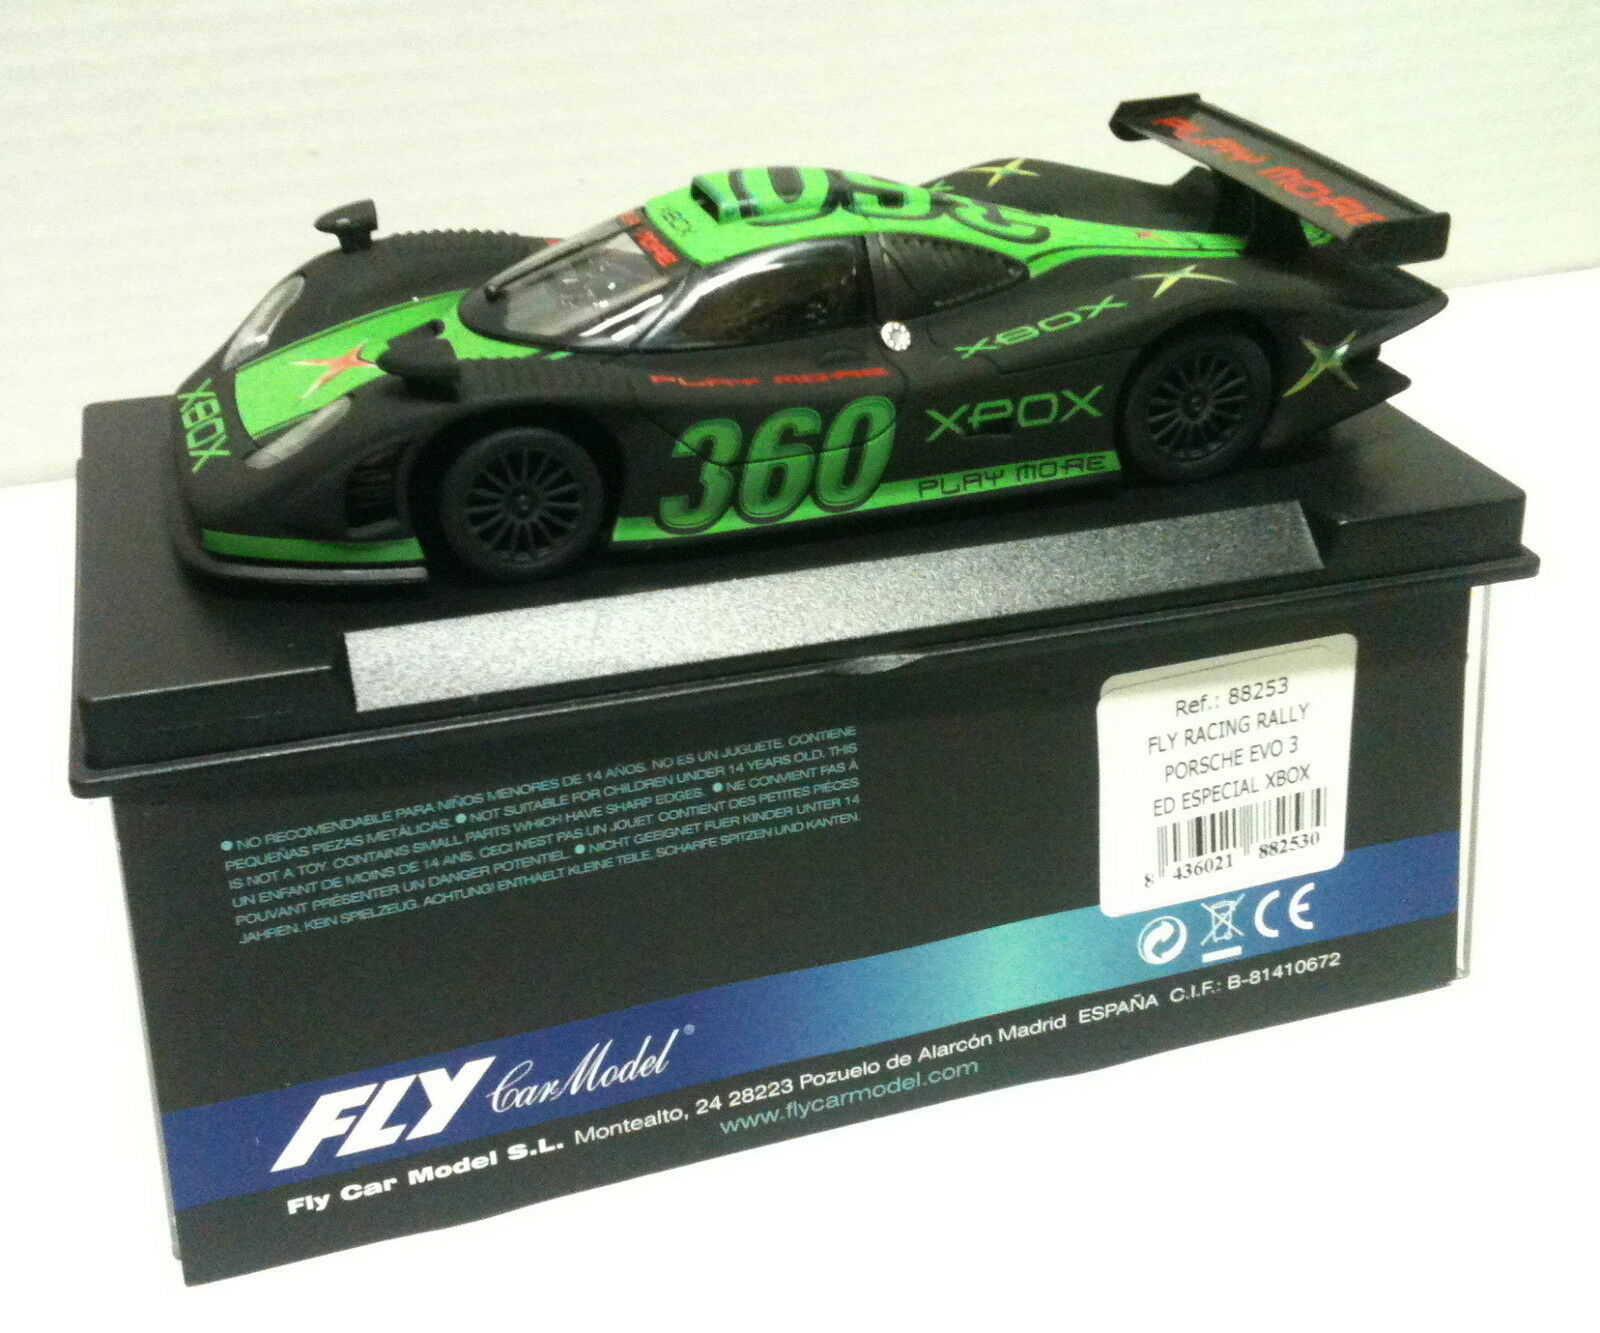 Qq 88253 FLY PORSCHE 911 EVO 3 EDICION SPECIAL 360 XBOX (IN URN)